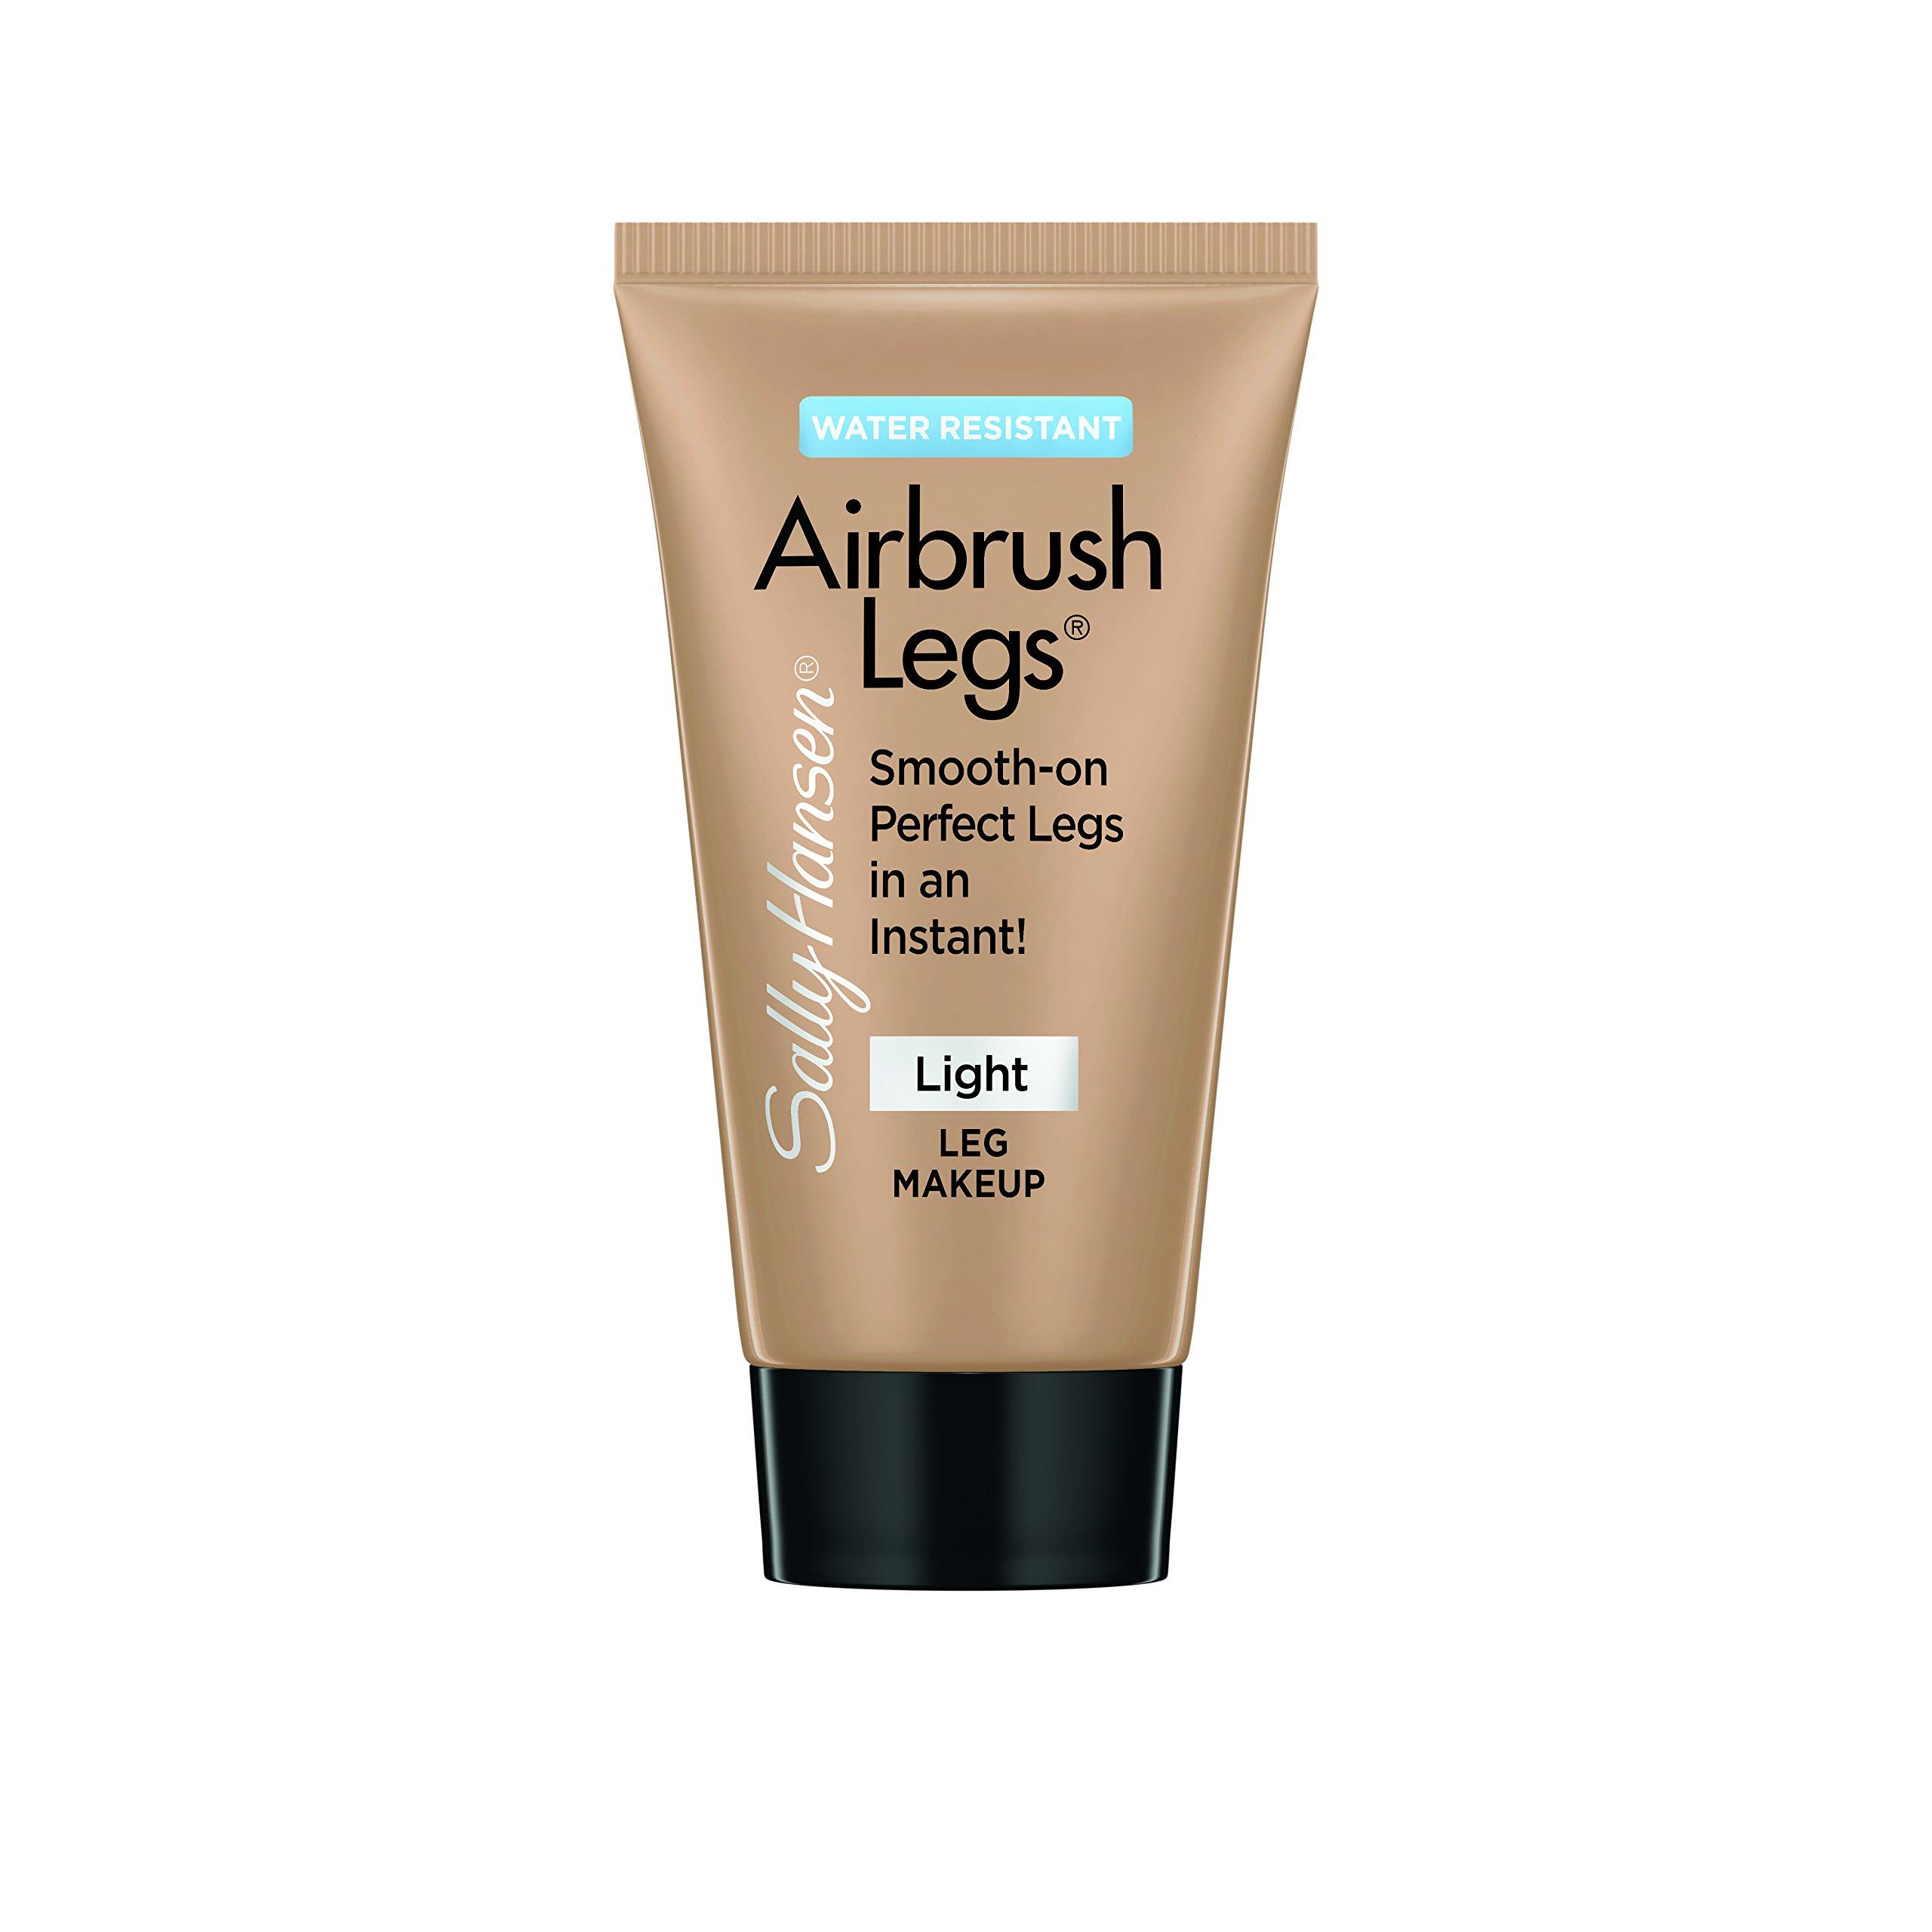 Sally Hansen Airbrush Legs Trial Size Liquid Tube, Light, 0.75 Fluid Ounce